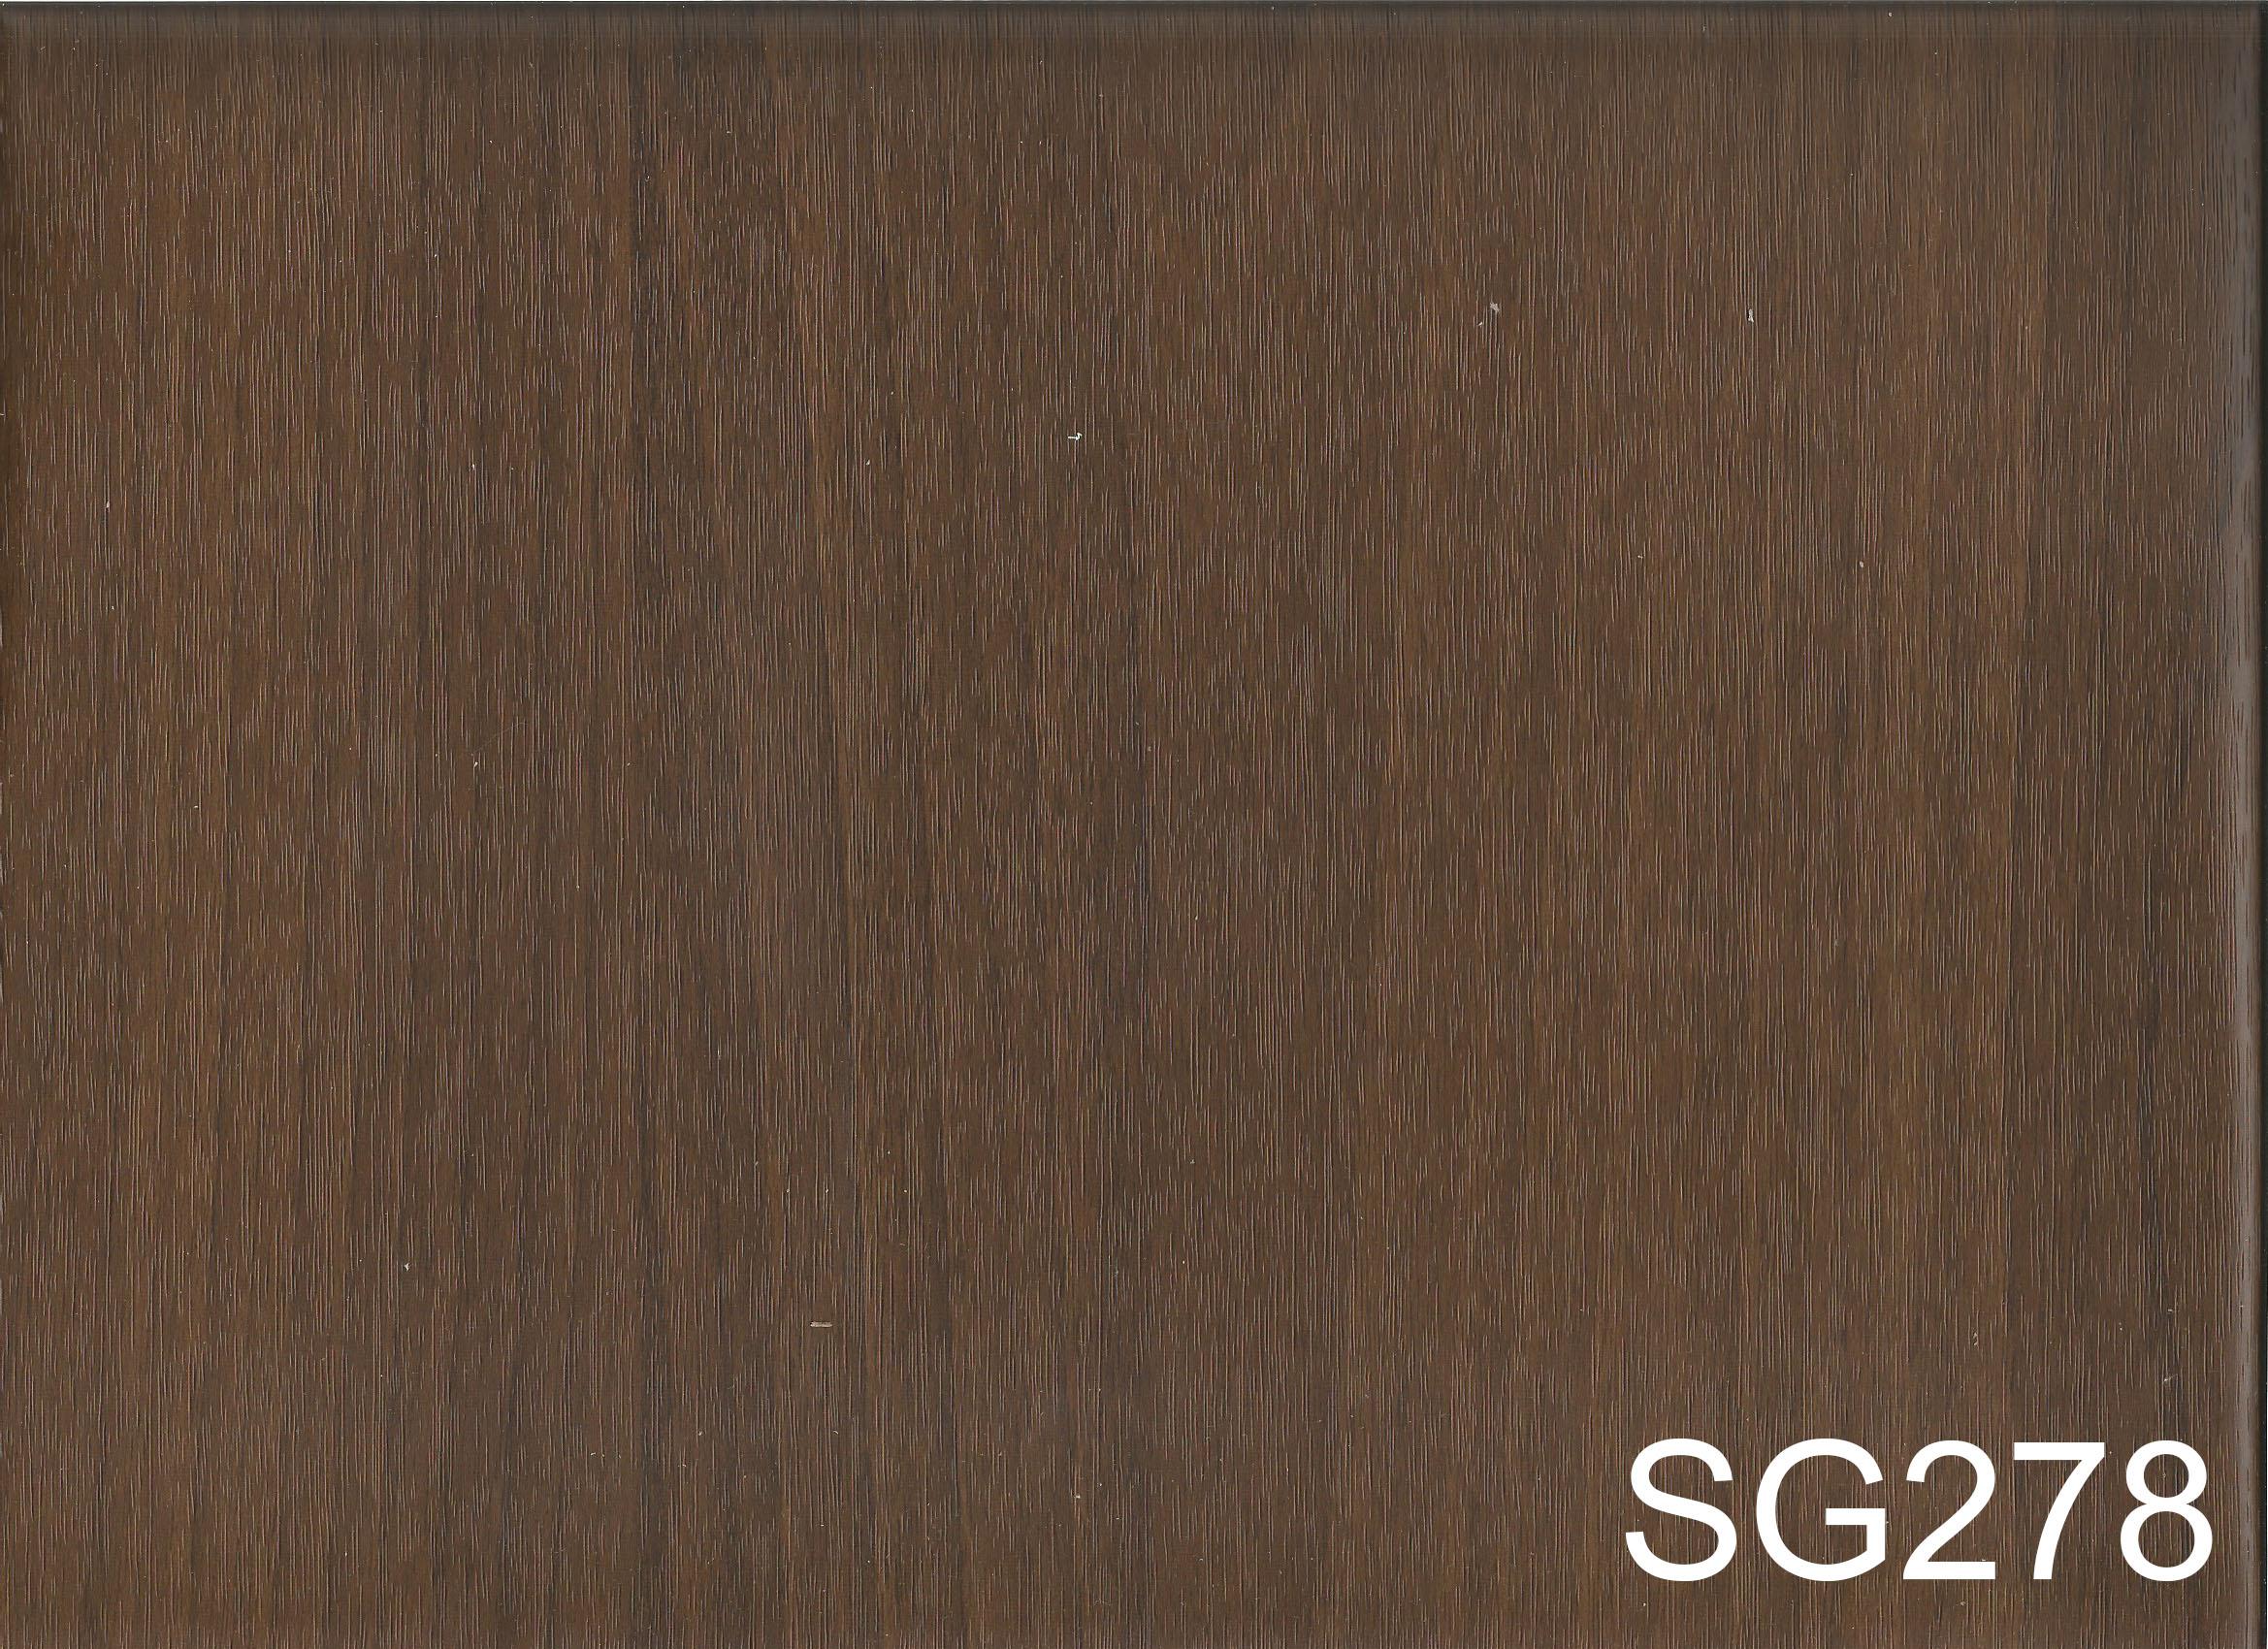 SG278